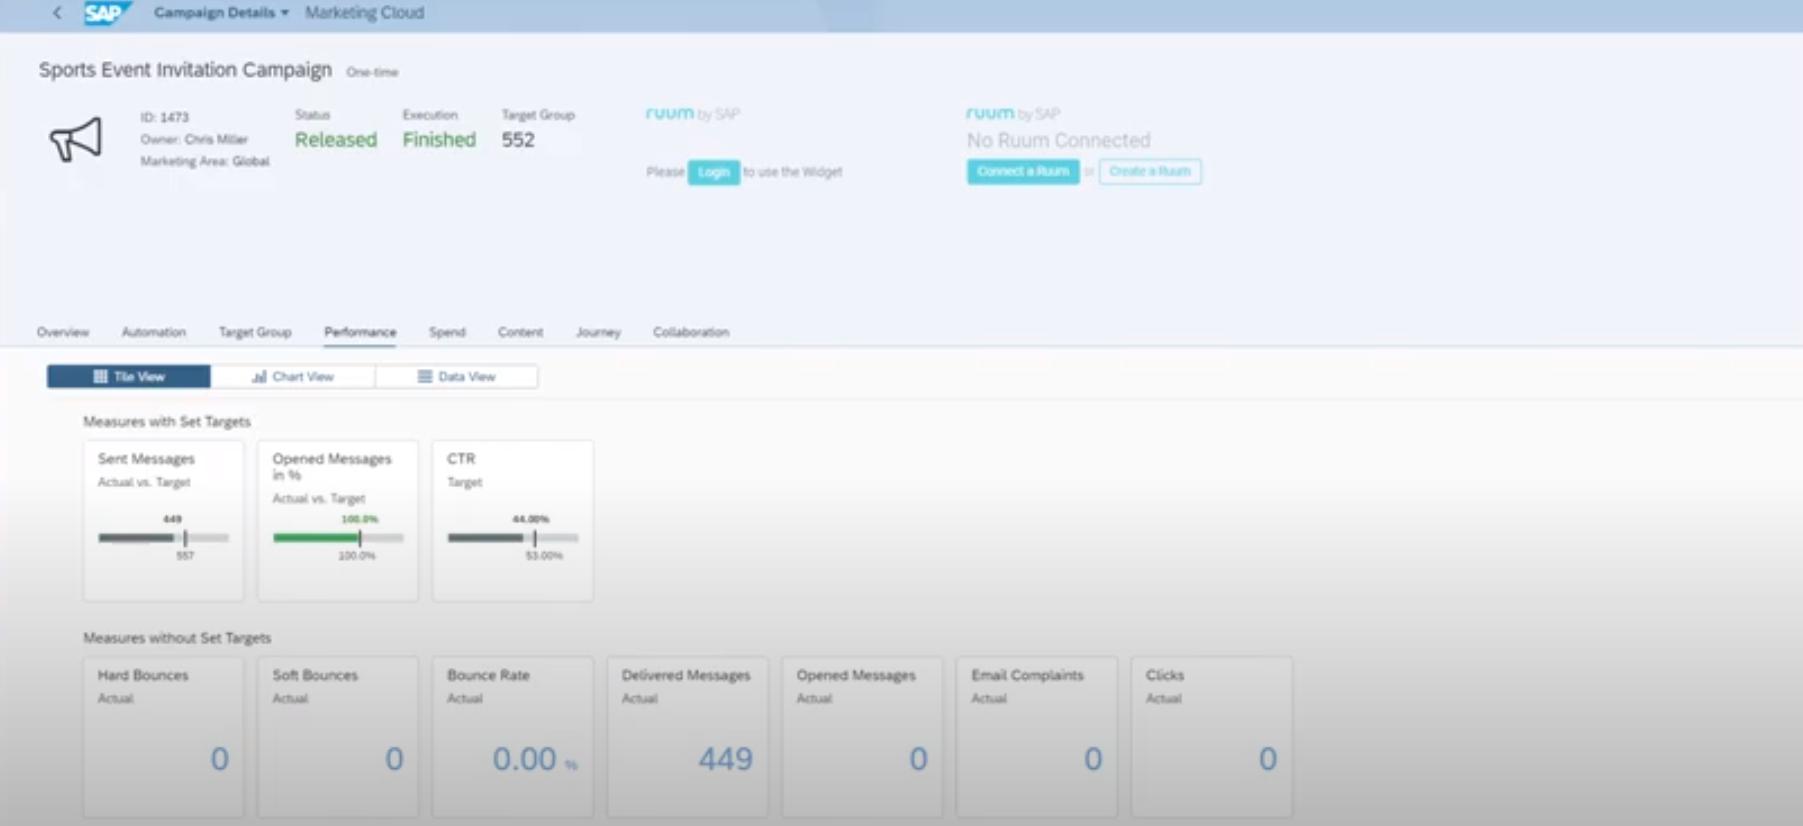 SAP Marketing Cloud campaign performance